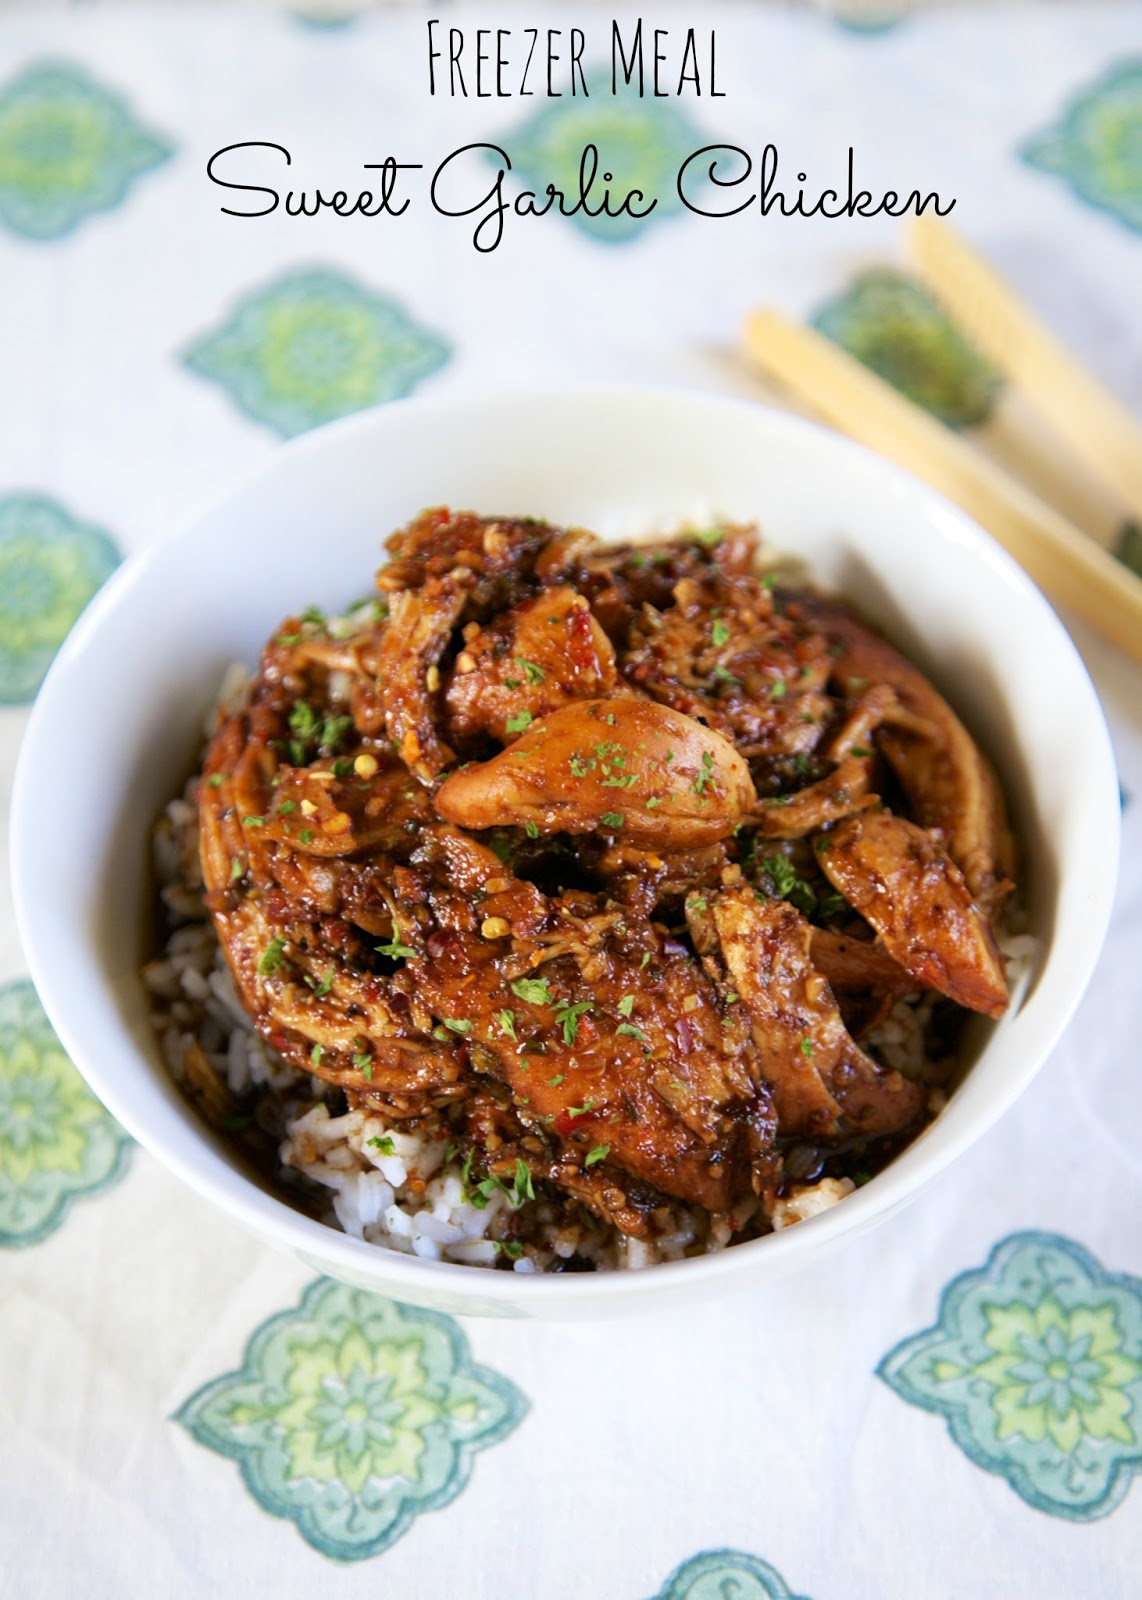 freezer meal sweet garlic chicken | 25+ Freezer to Crockpot Meals